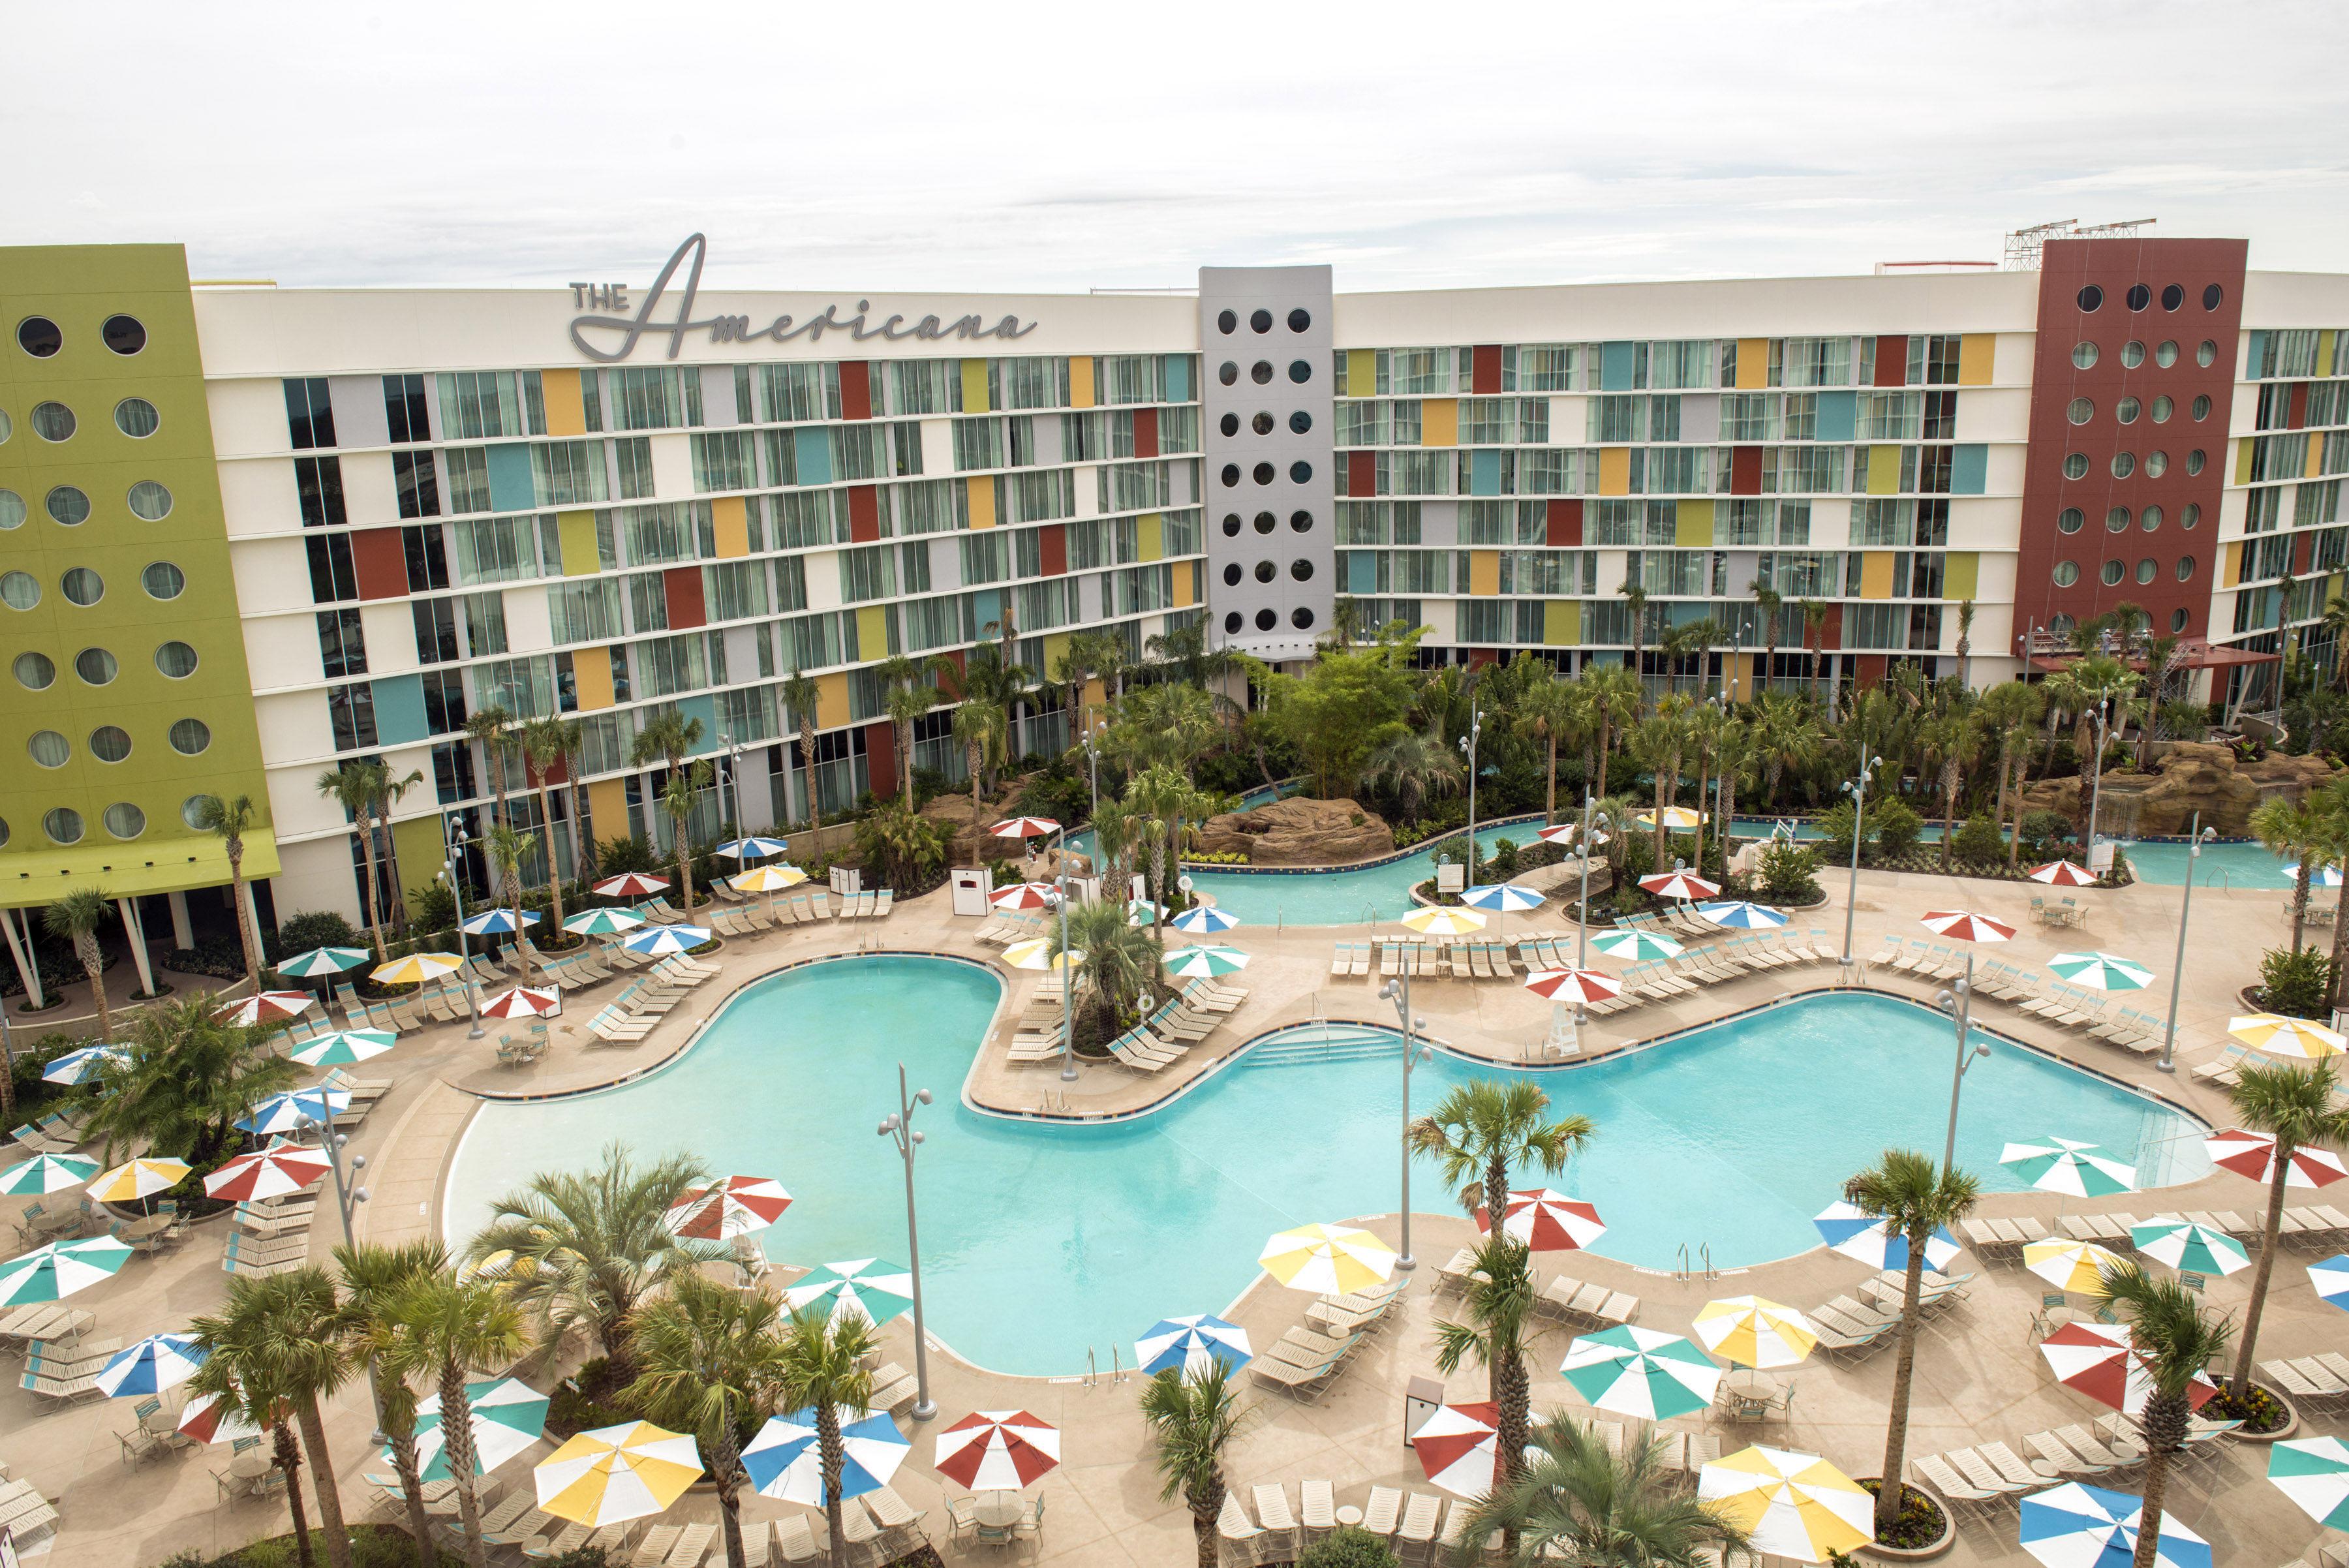 Mejores Hoteles para familias - Resorts en Orlando, FL Ofertas de hoteles baratos